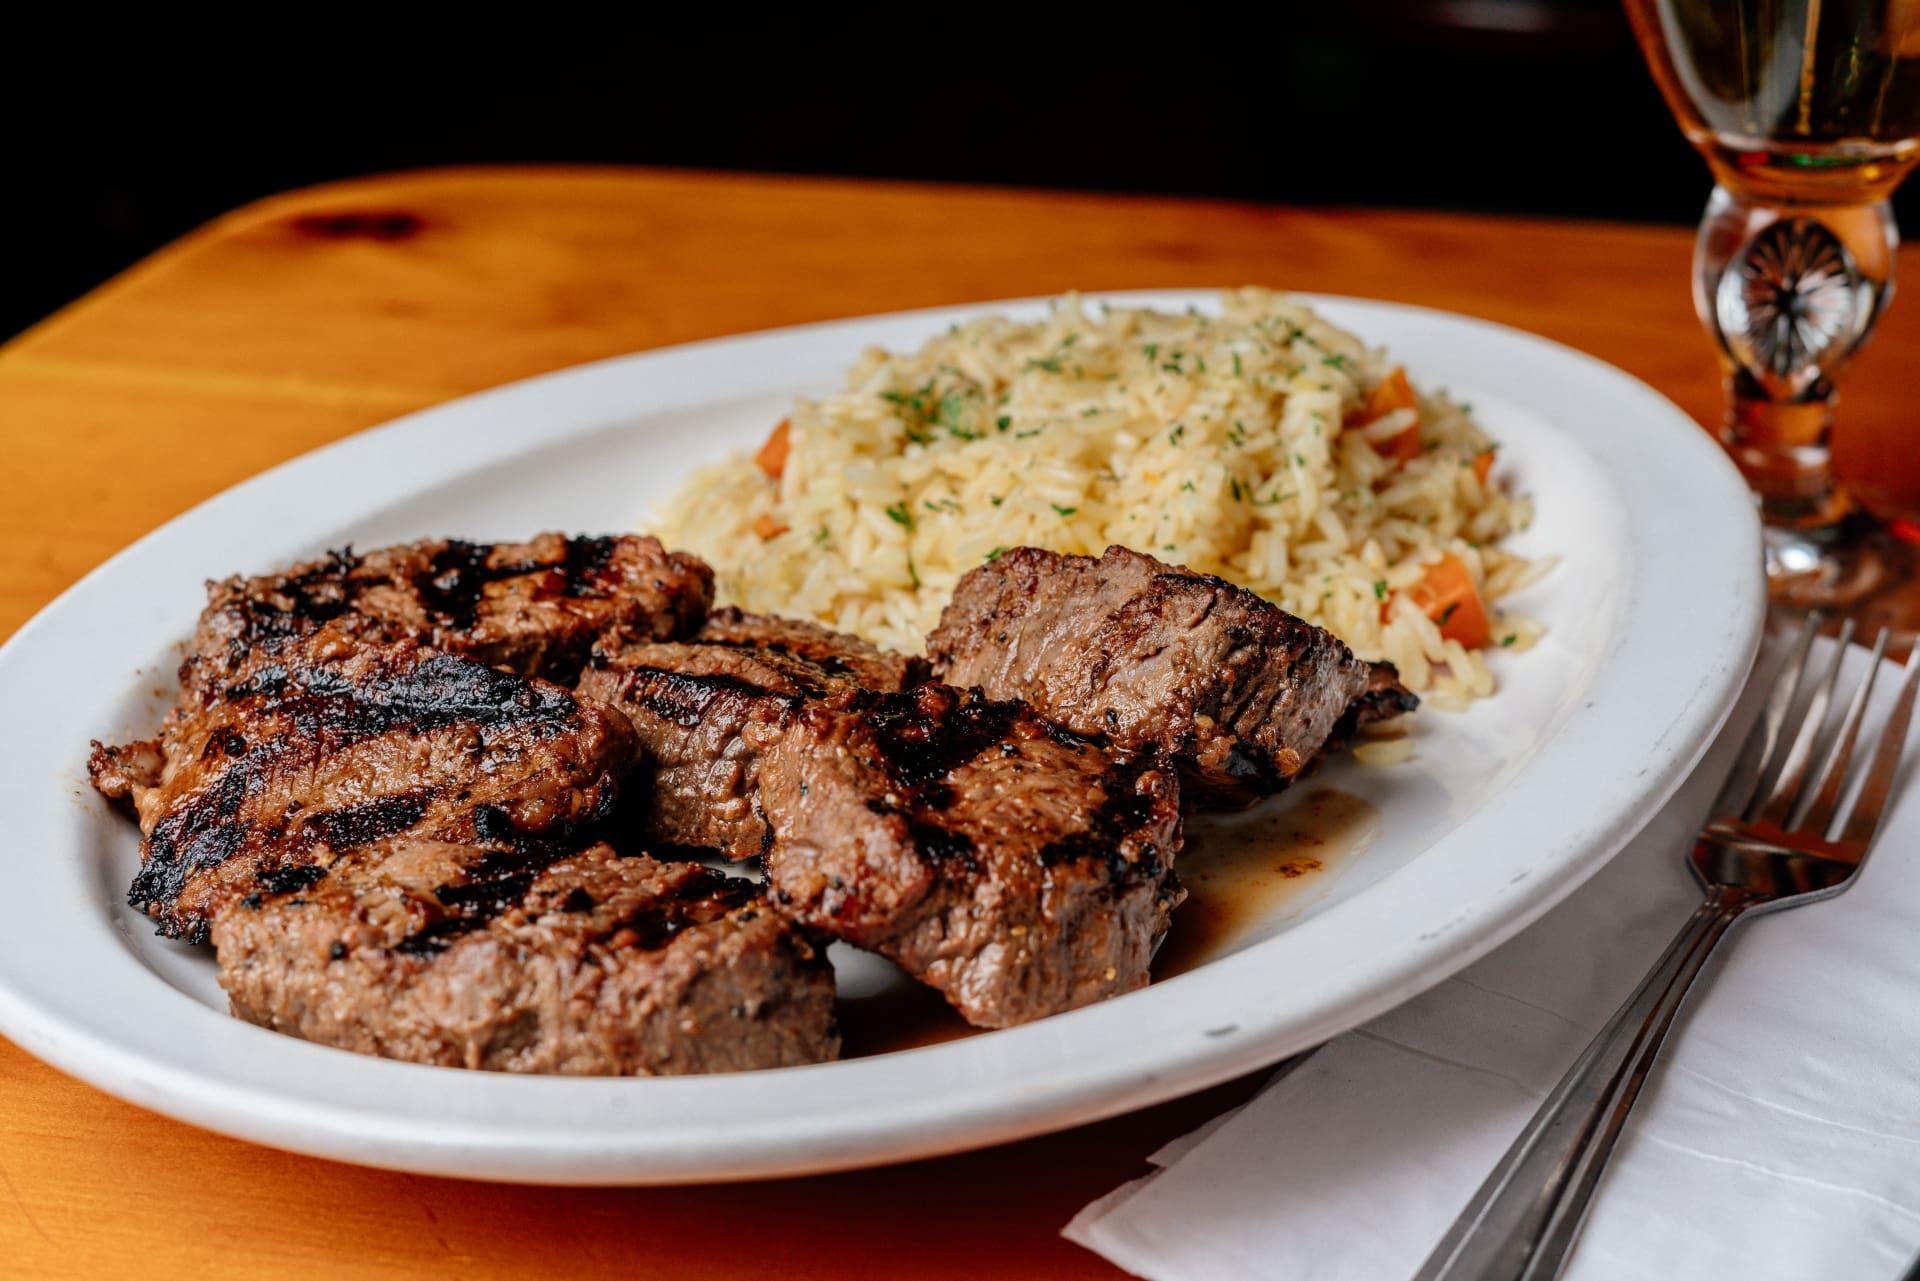 Charbroiled Steak Tips